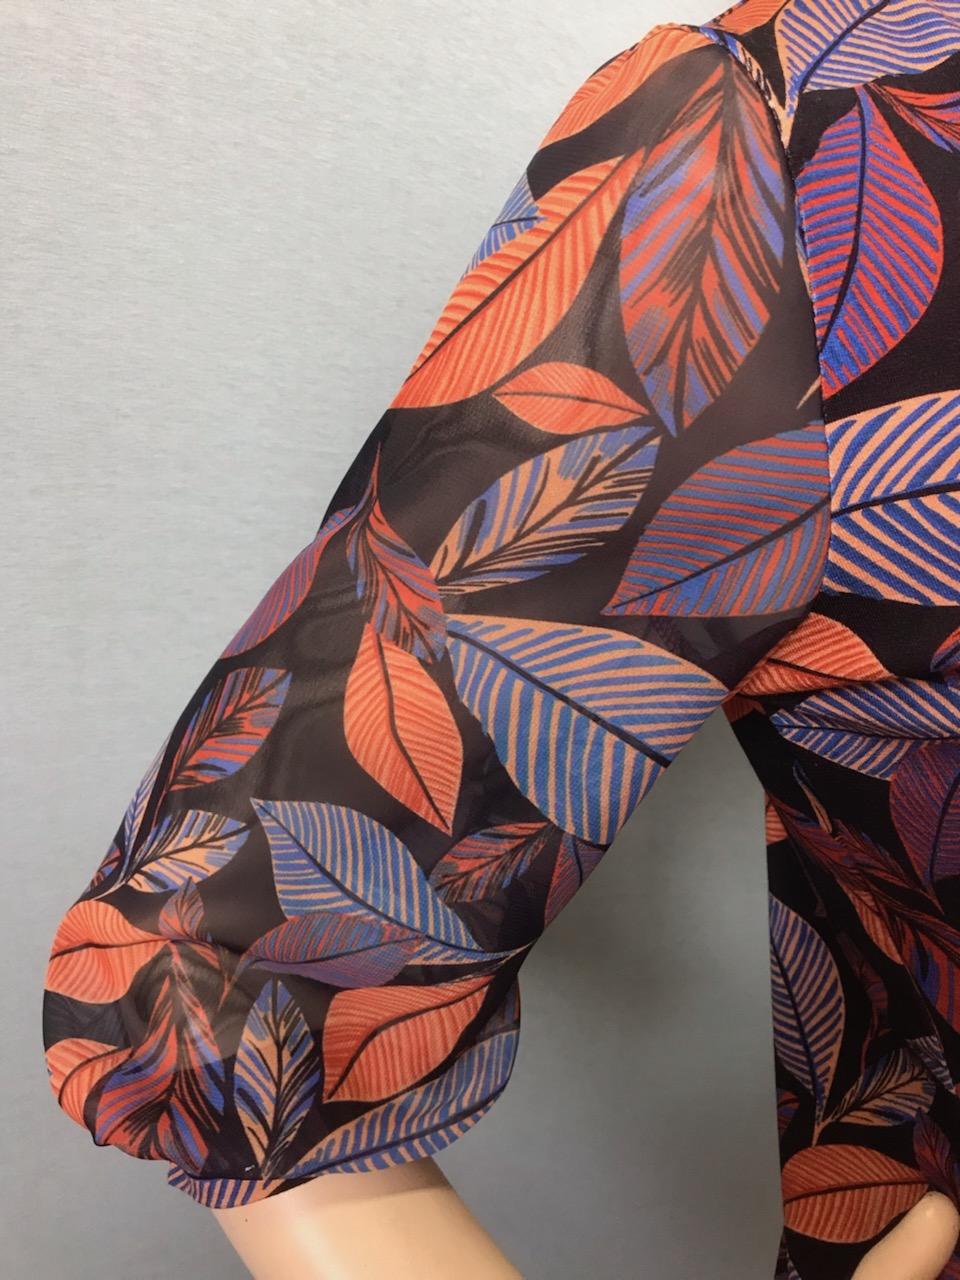 Фото блузка, состав вискоза и шифон, размеры 46-54, артикул 205.1-7h